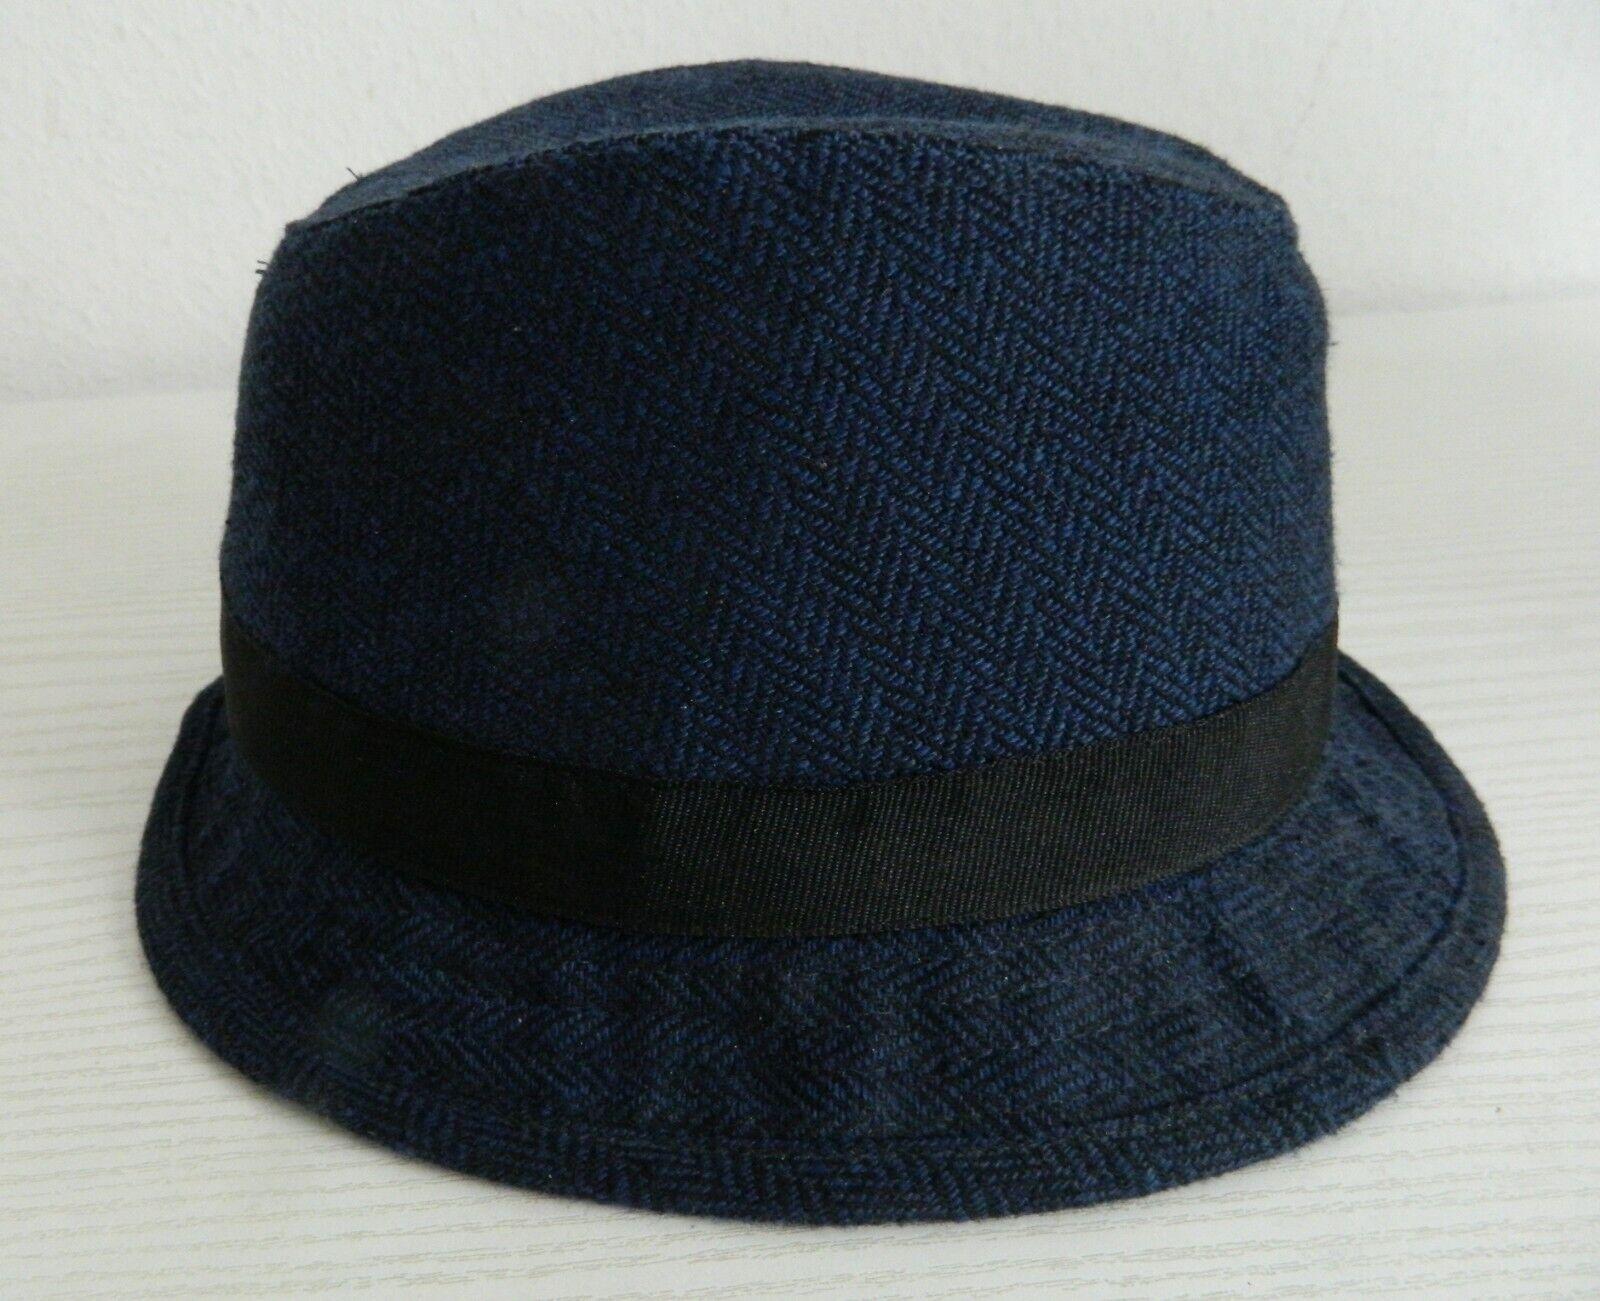 H&M Hut Kinder Gr. 146/152, 11-12 Jahre, dunkelblau